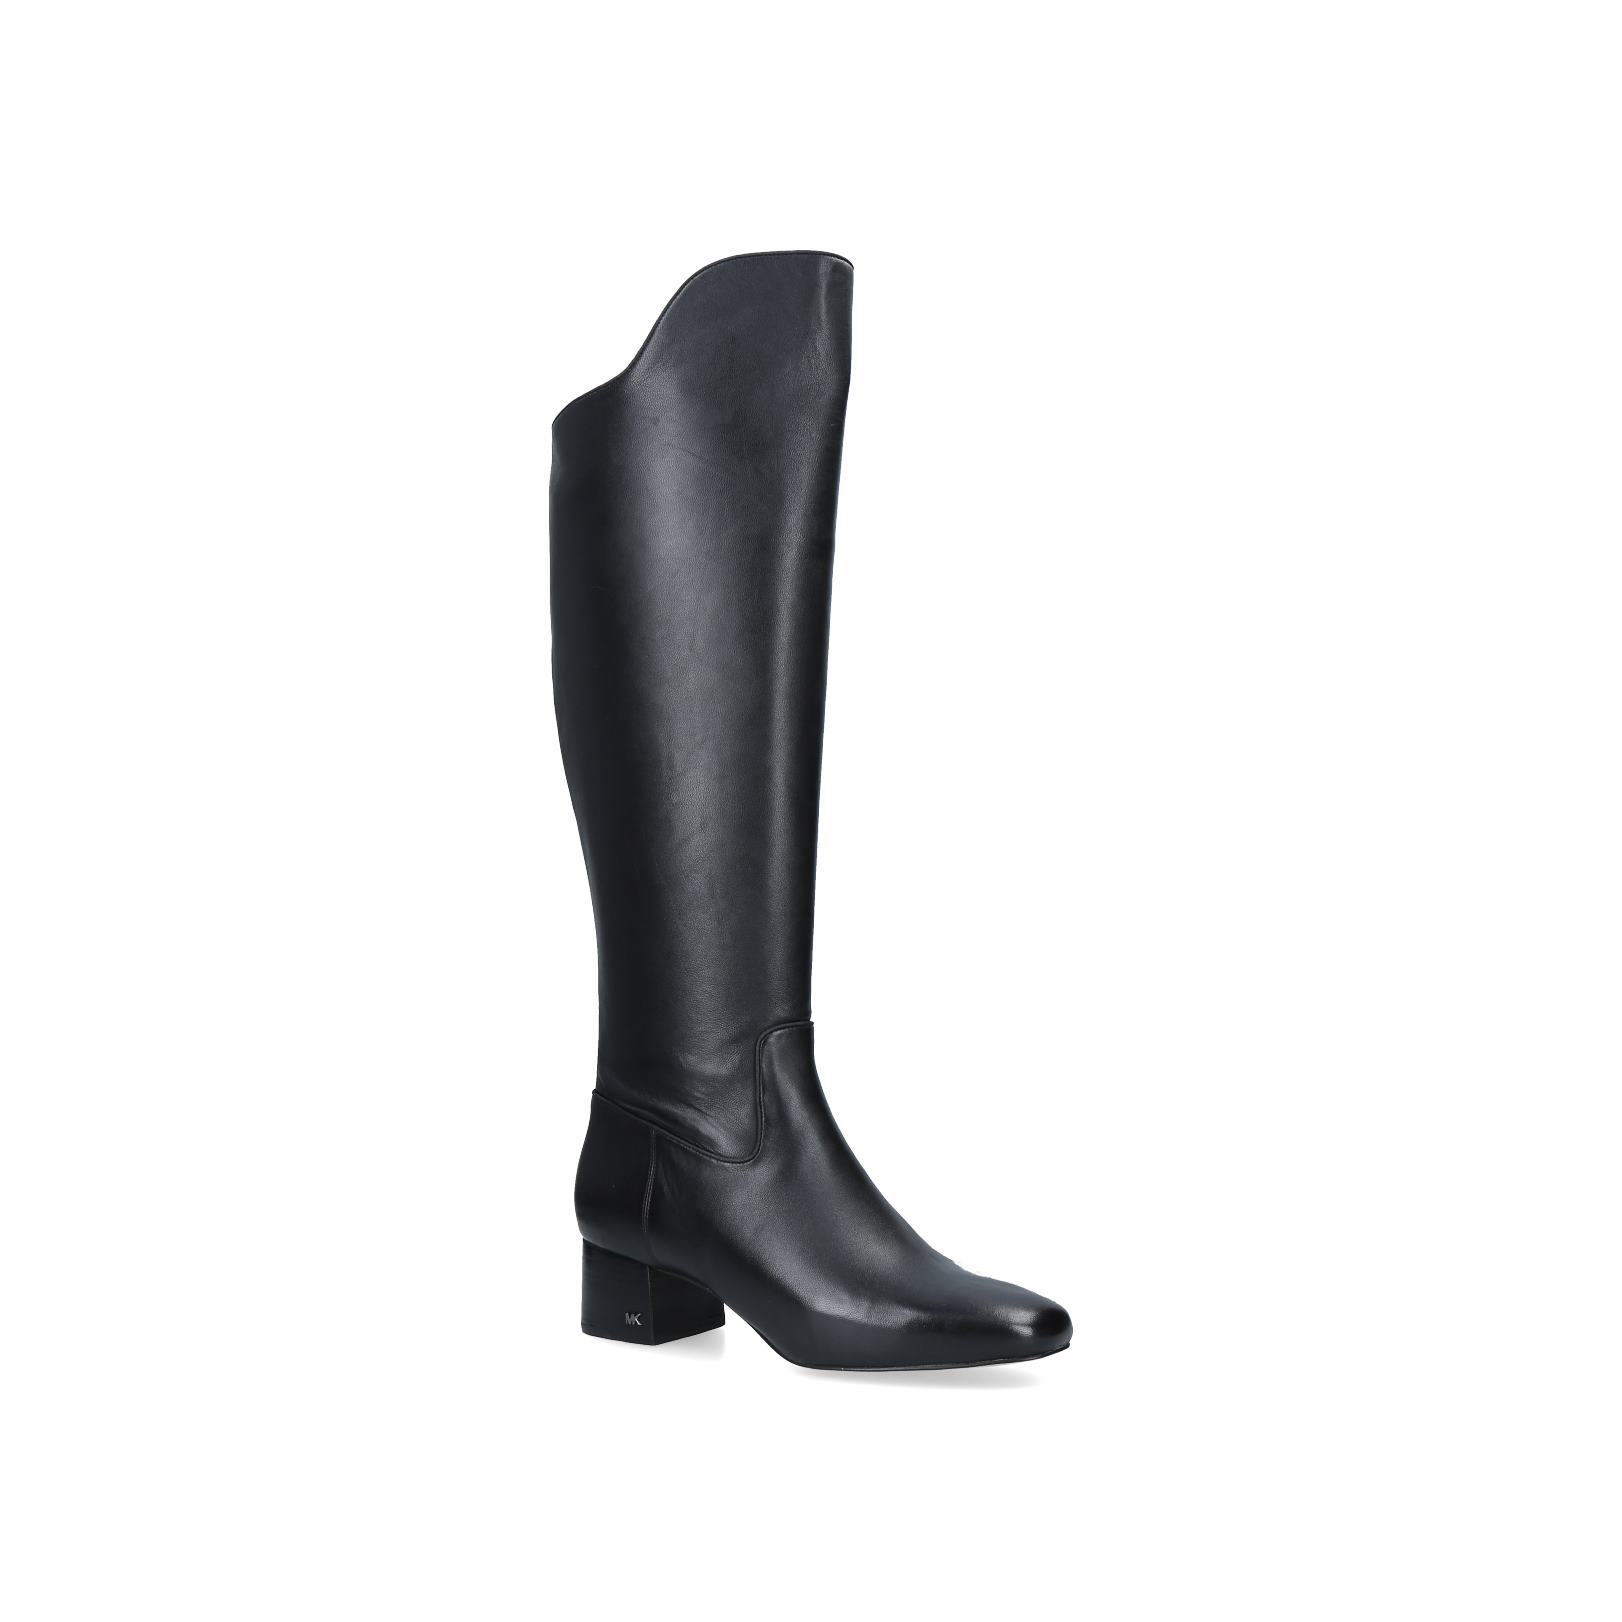 35192a950d2d BLAINE BOOT - MICHAEL MICHAEL KORS Boots